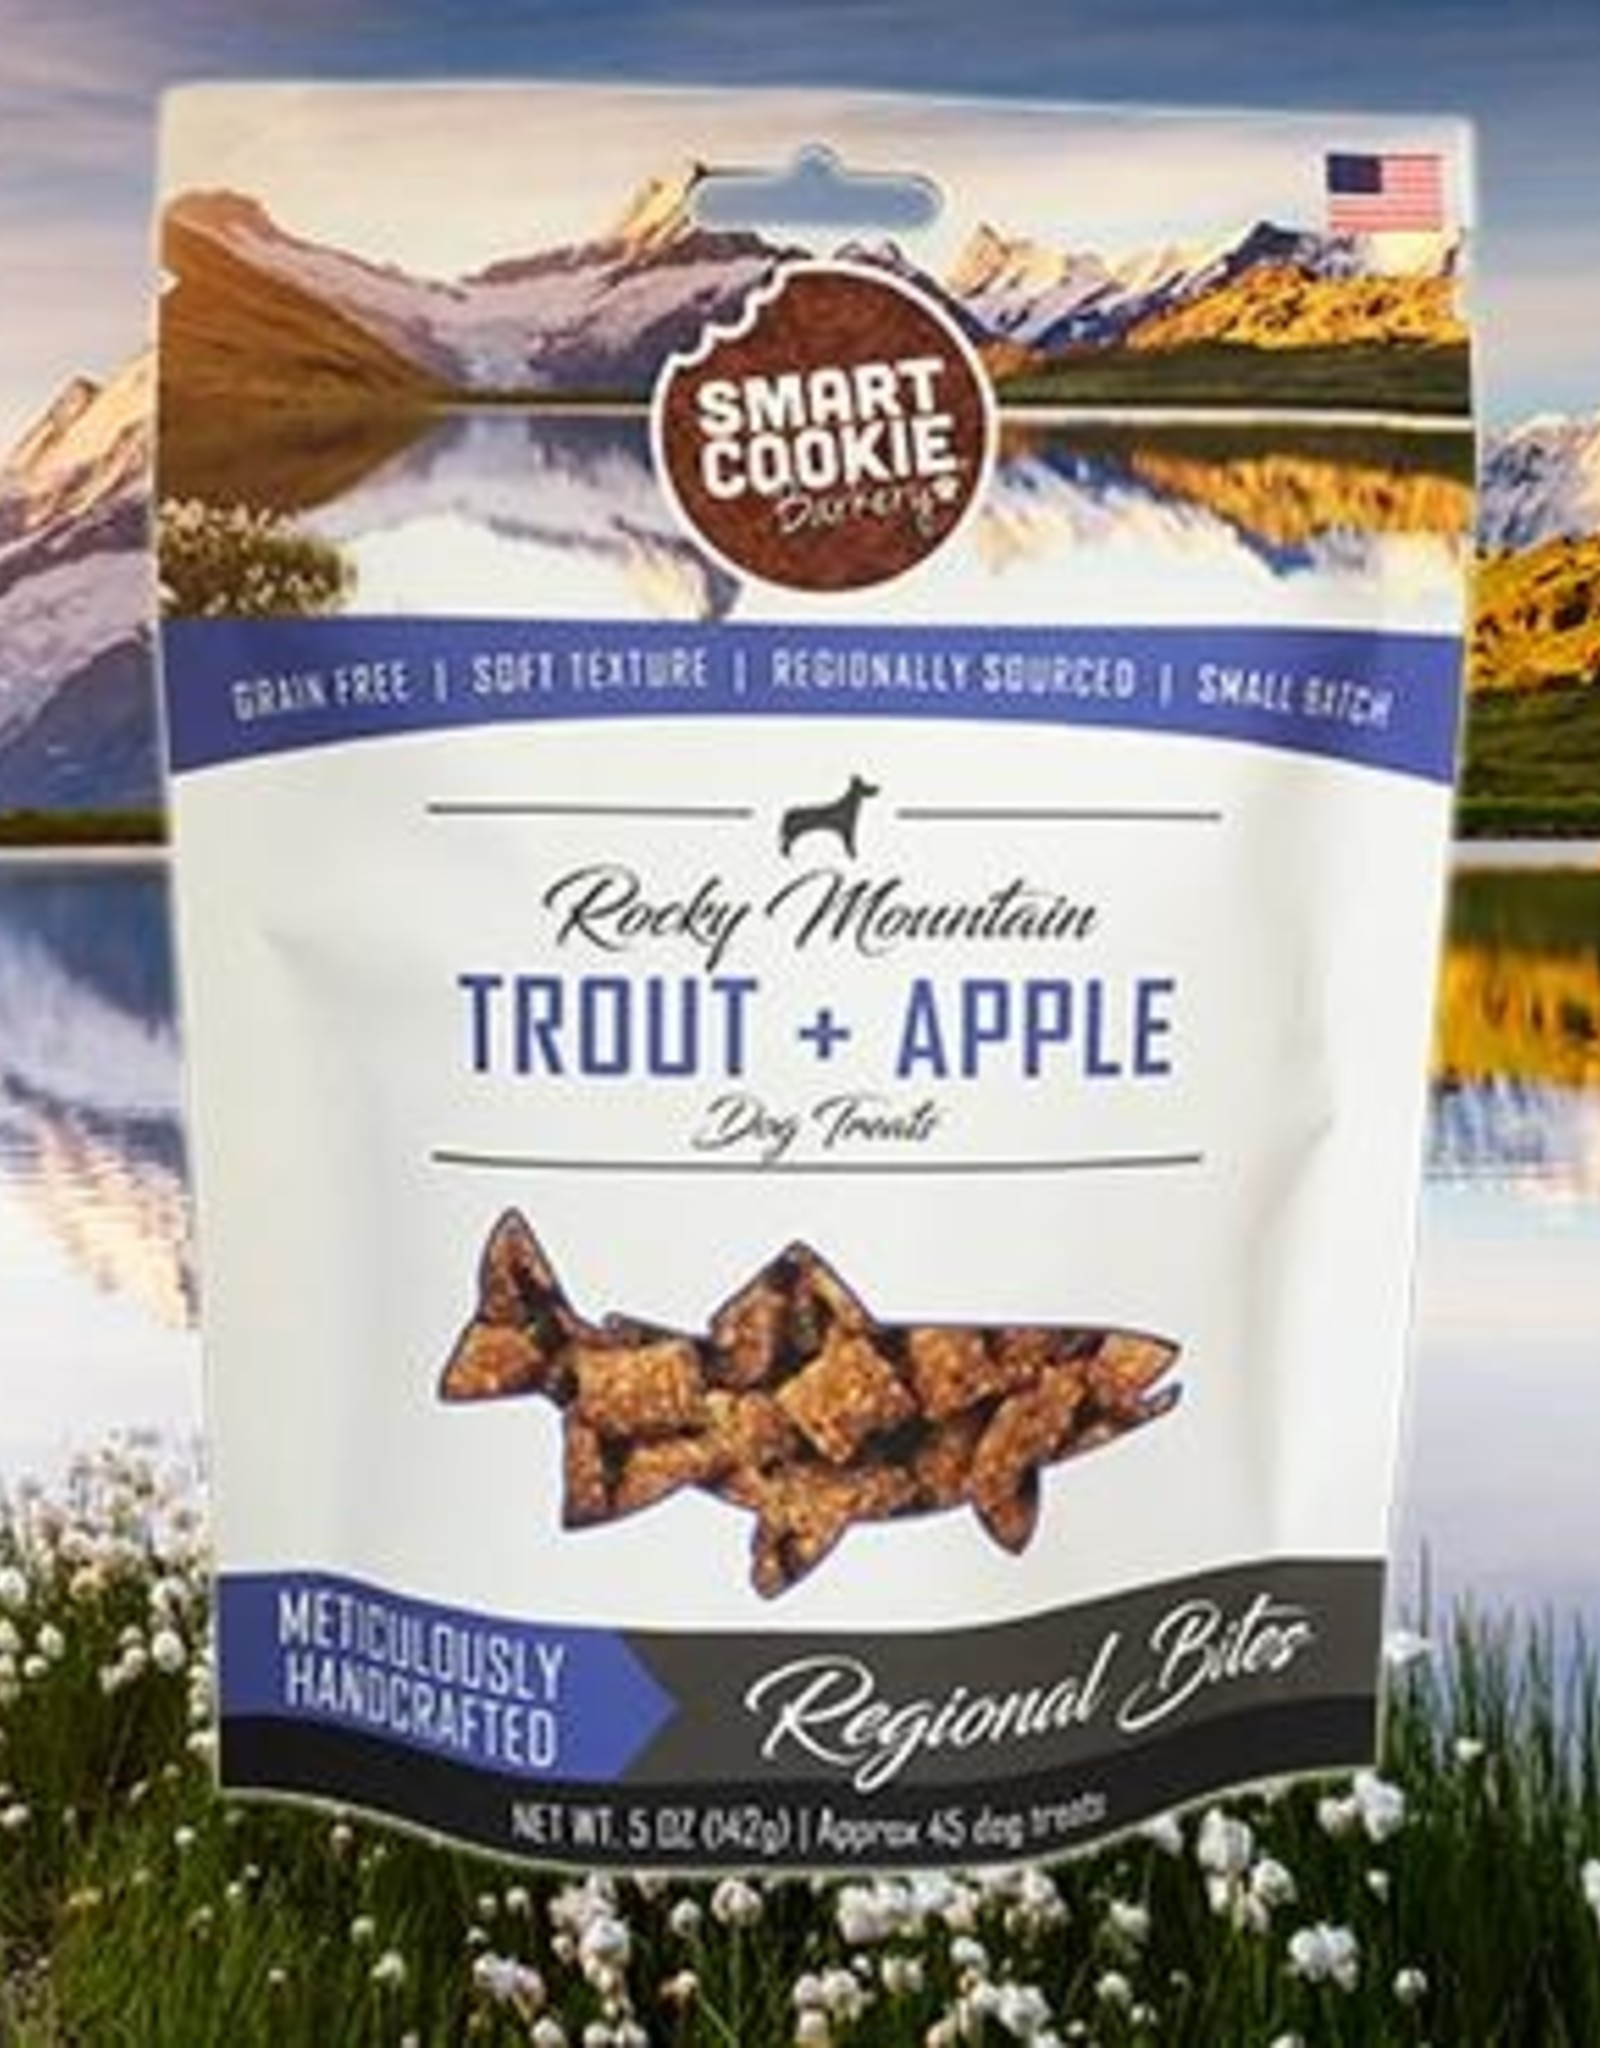 Smart Cookie Treats Dog Trout & Apple Treats - 5oz